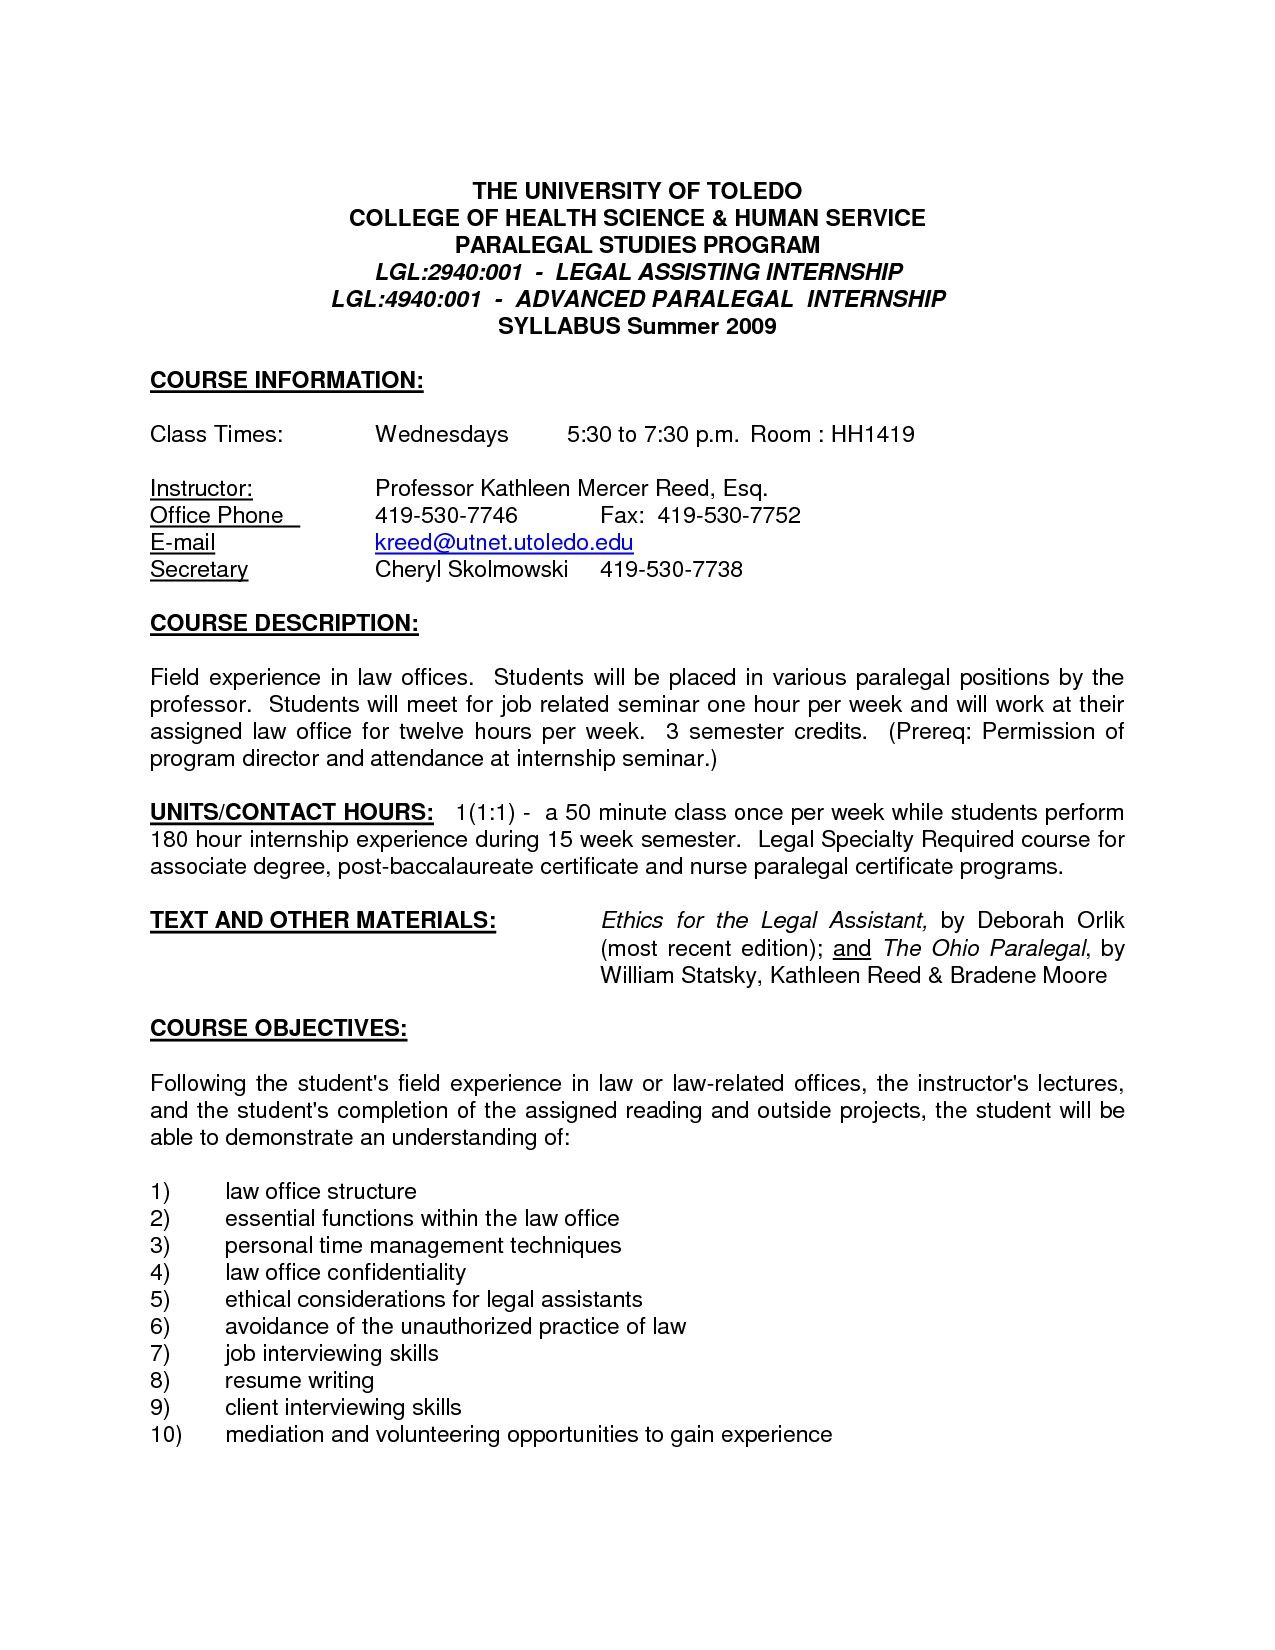 Best Refrence Valid Sample Of Application Letter For A Bank Clerk By Httpwaldwert Visit Details Ht Cover Letter For Resume Cover Letter Tips Job Cover Letter